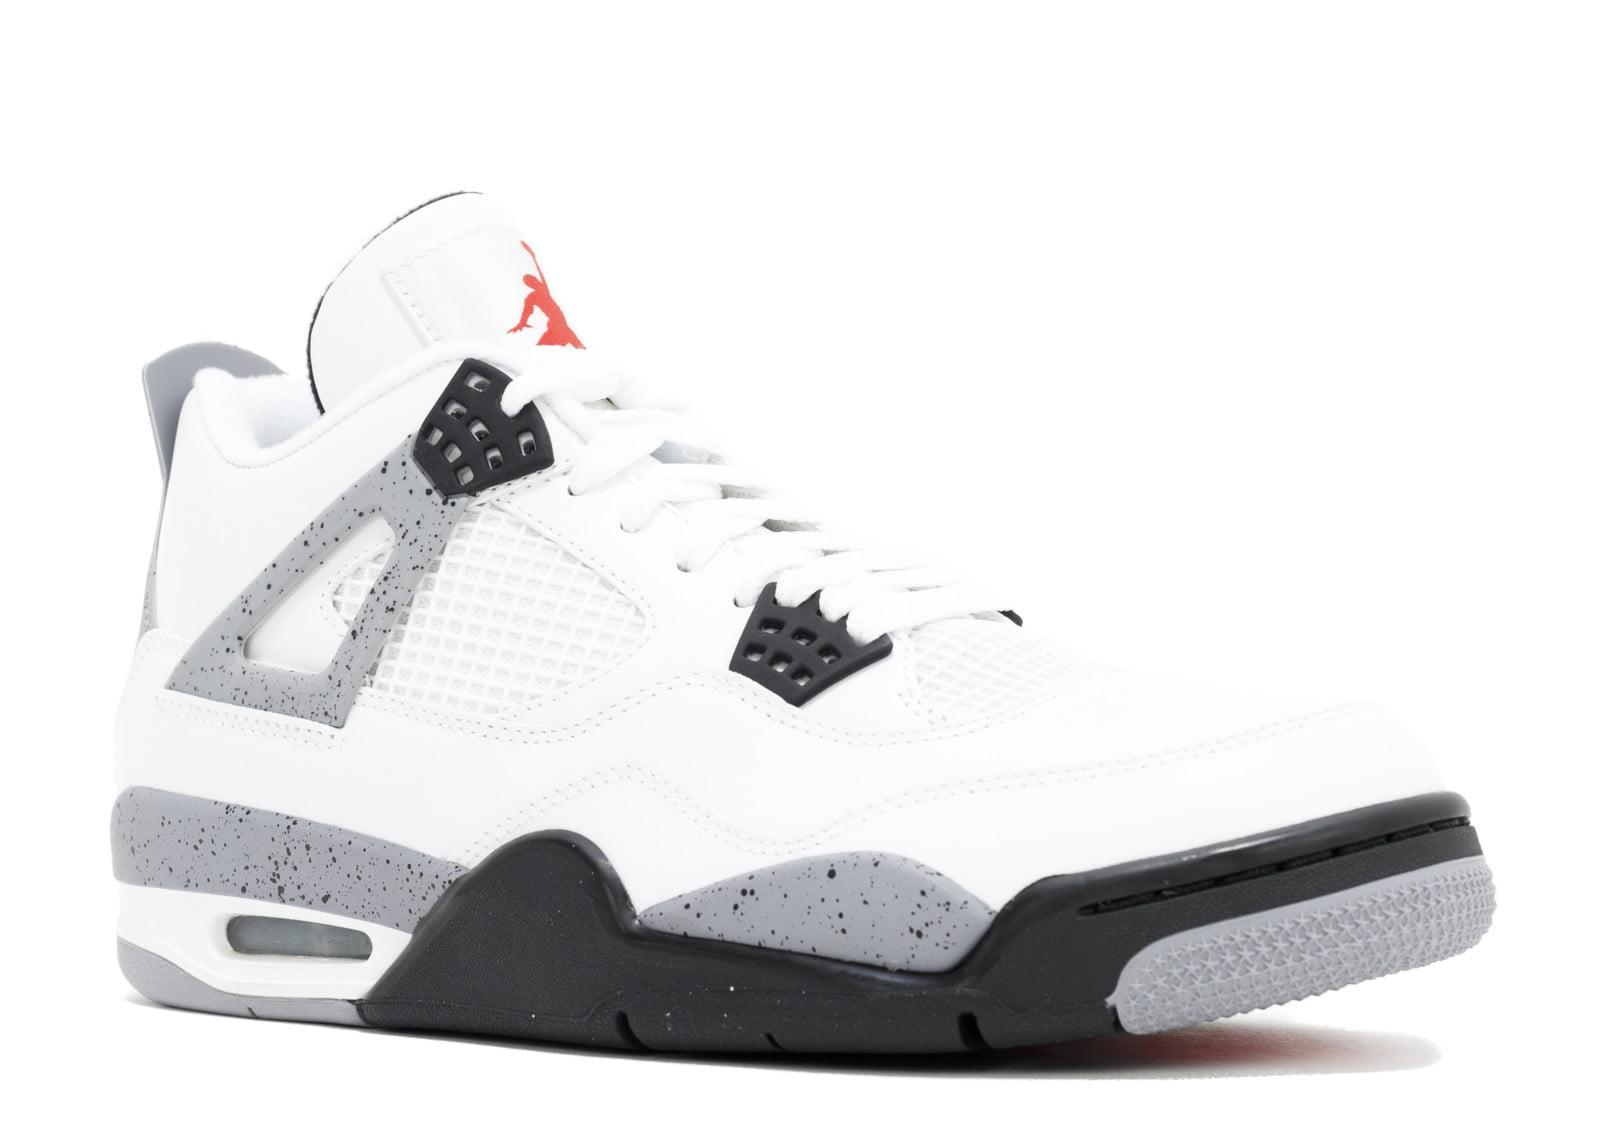 0a205e06be7941 Air Jordan - Men - Air Jordan 4 Retro  White Cement 2012 Release  -  308497-103 - Size 10